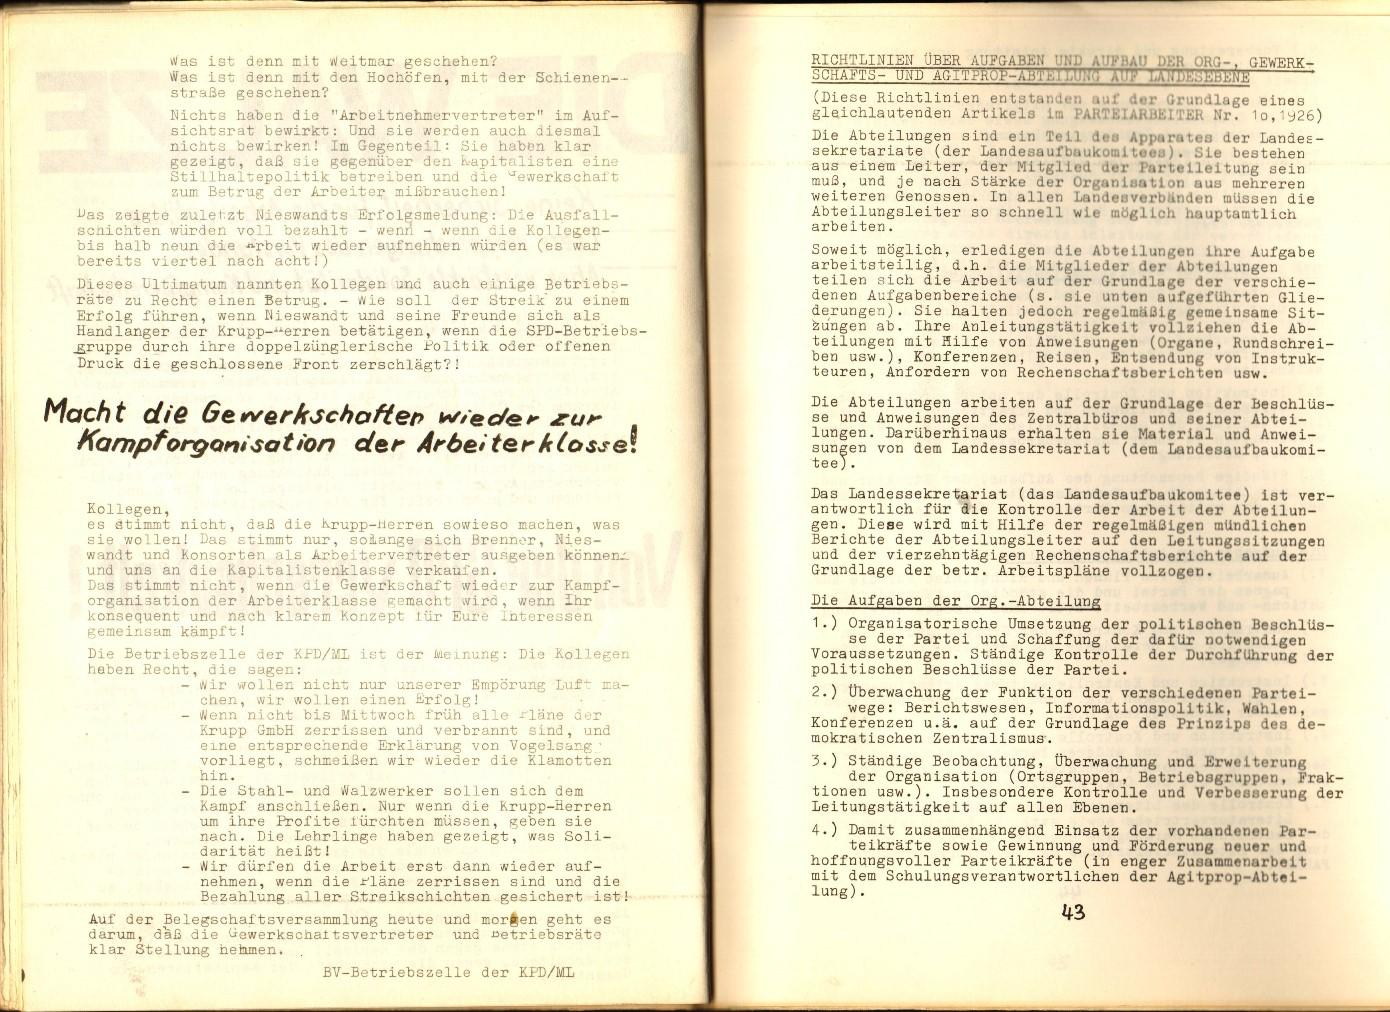 ZB_Parteiarbeiter_1970_03_26